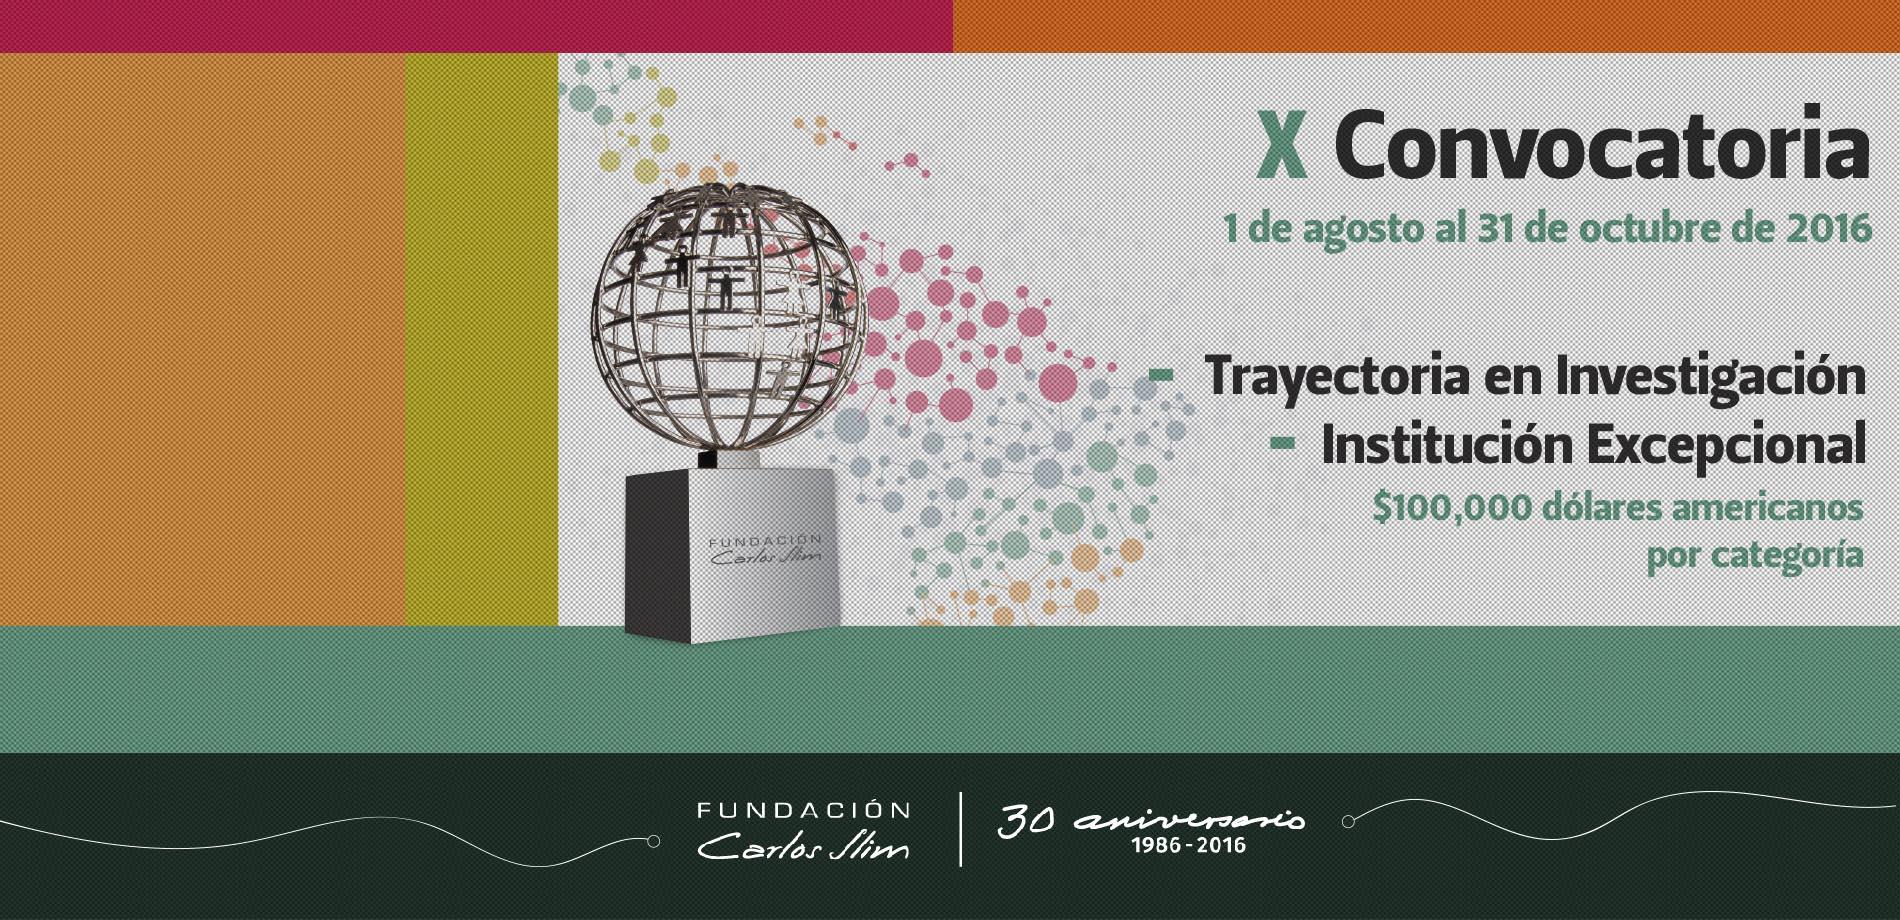 8 Premios X Convocatoria